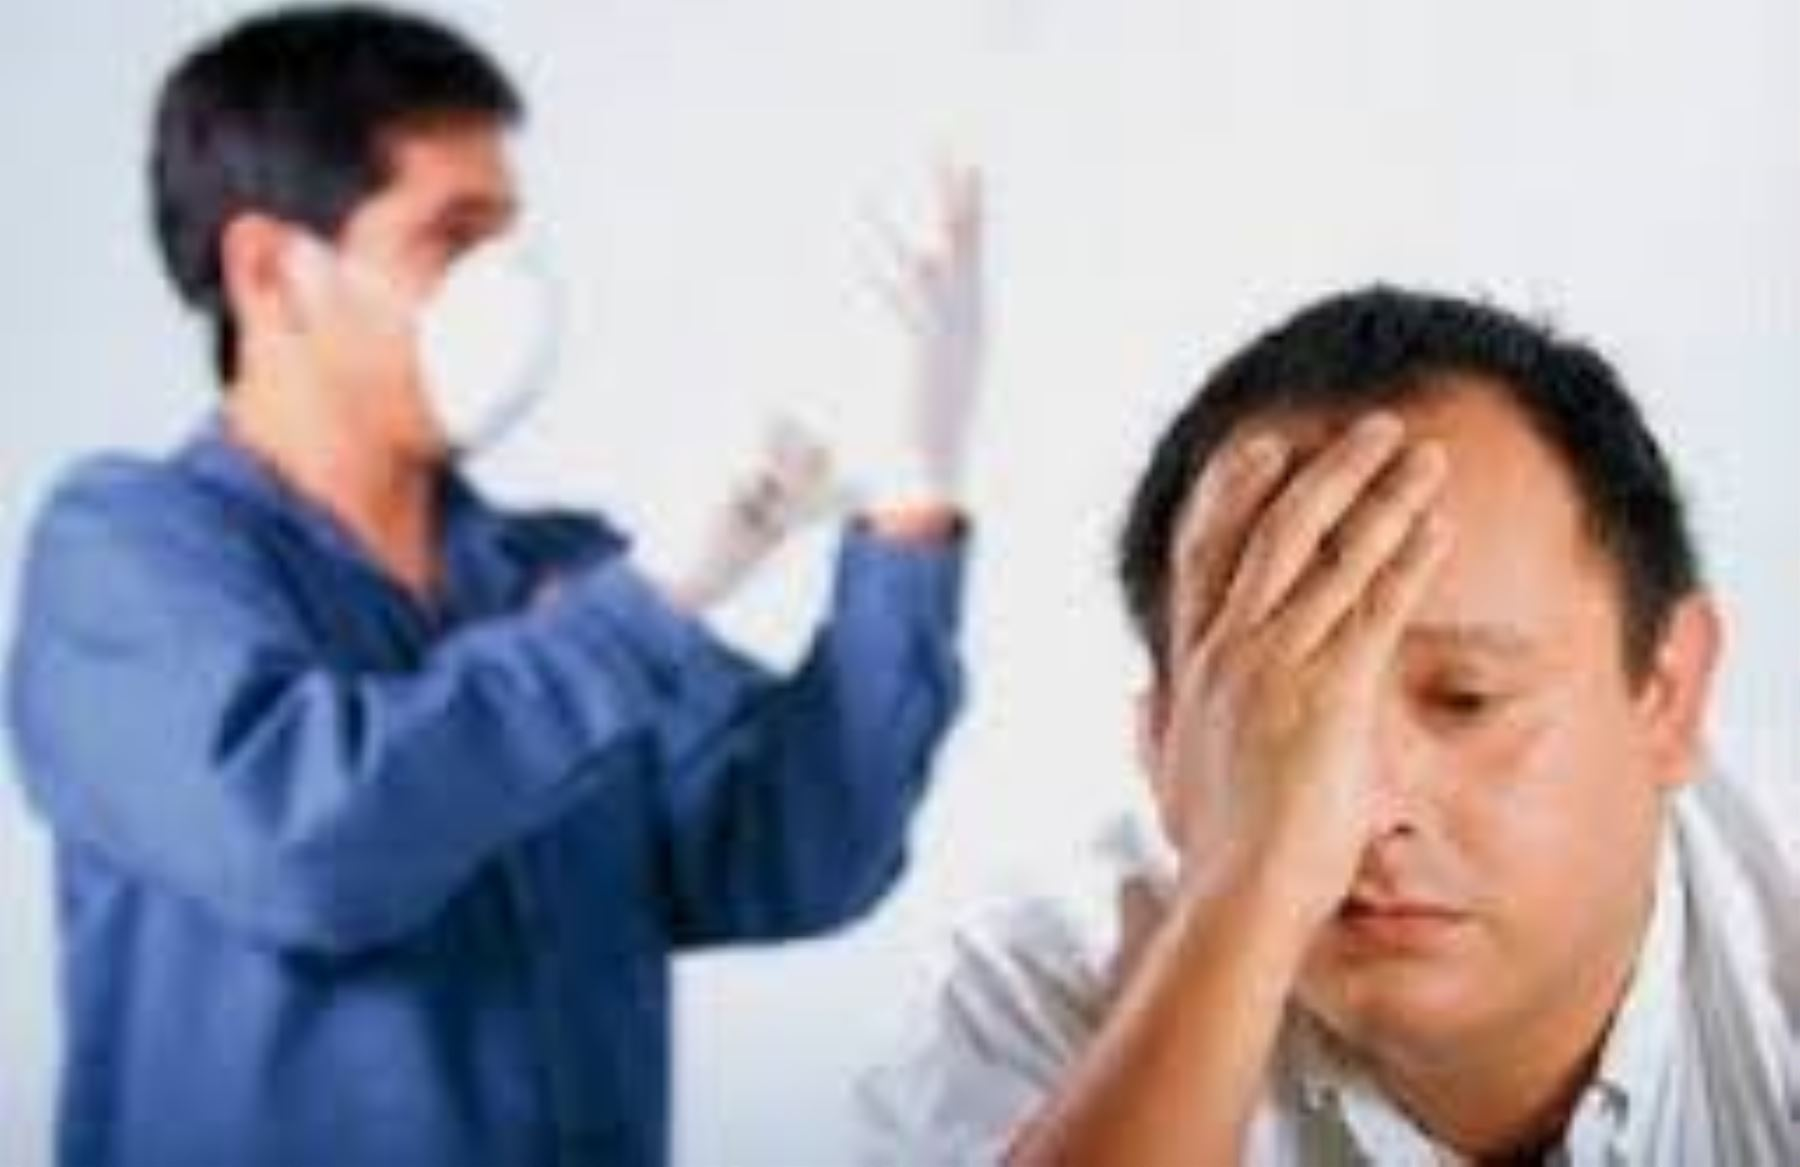 Examen de tacto rectal. Foto: Difusión